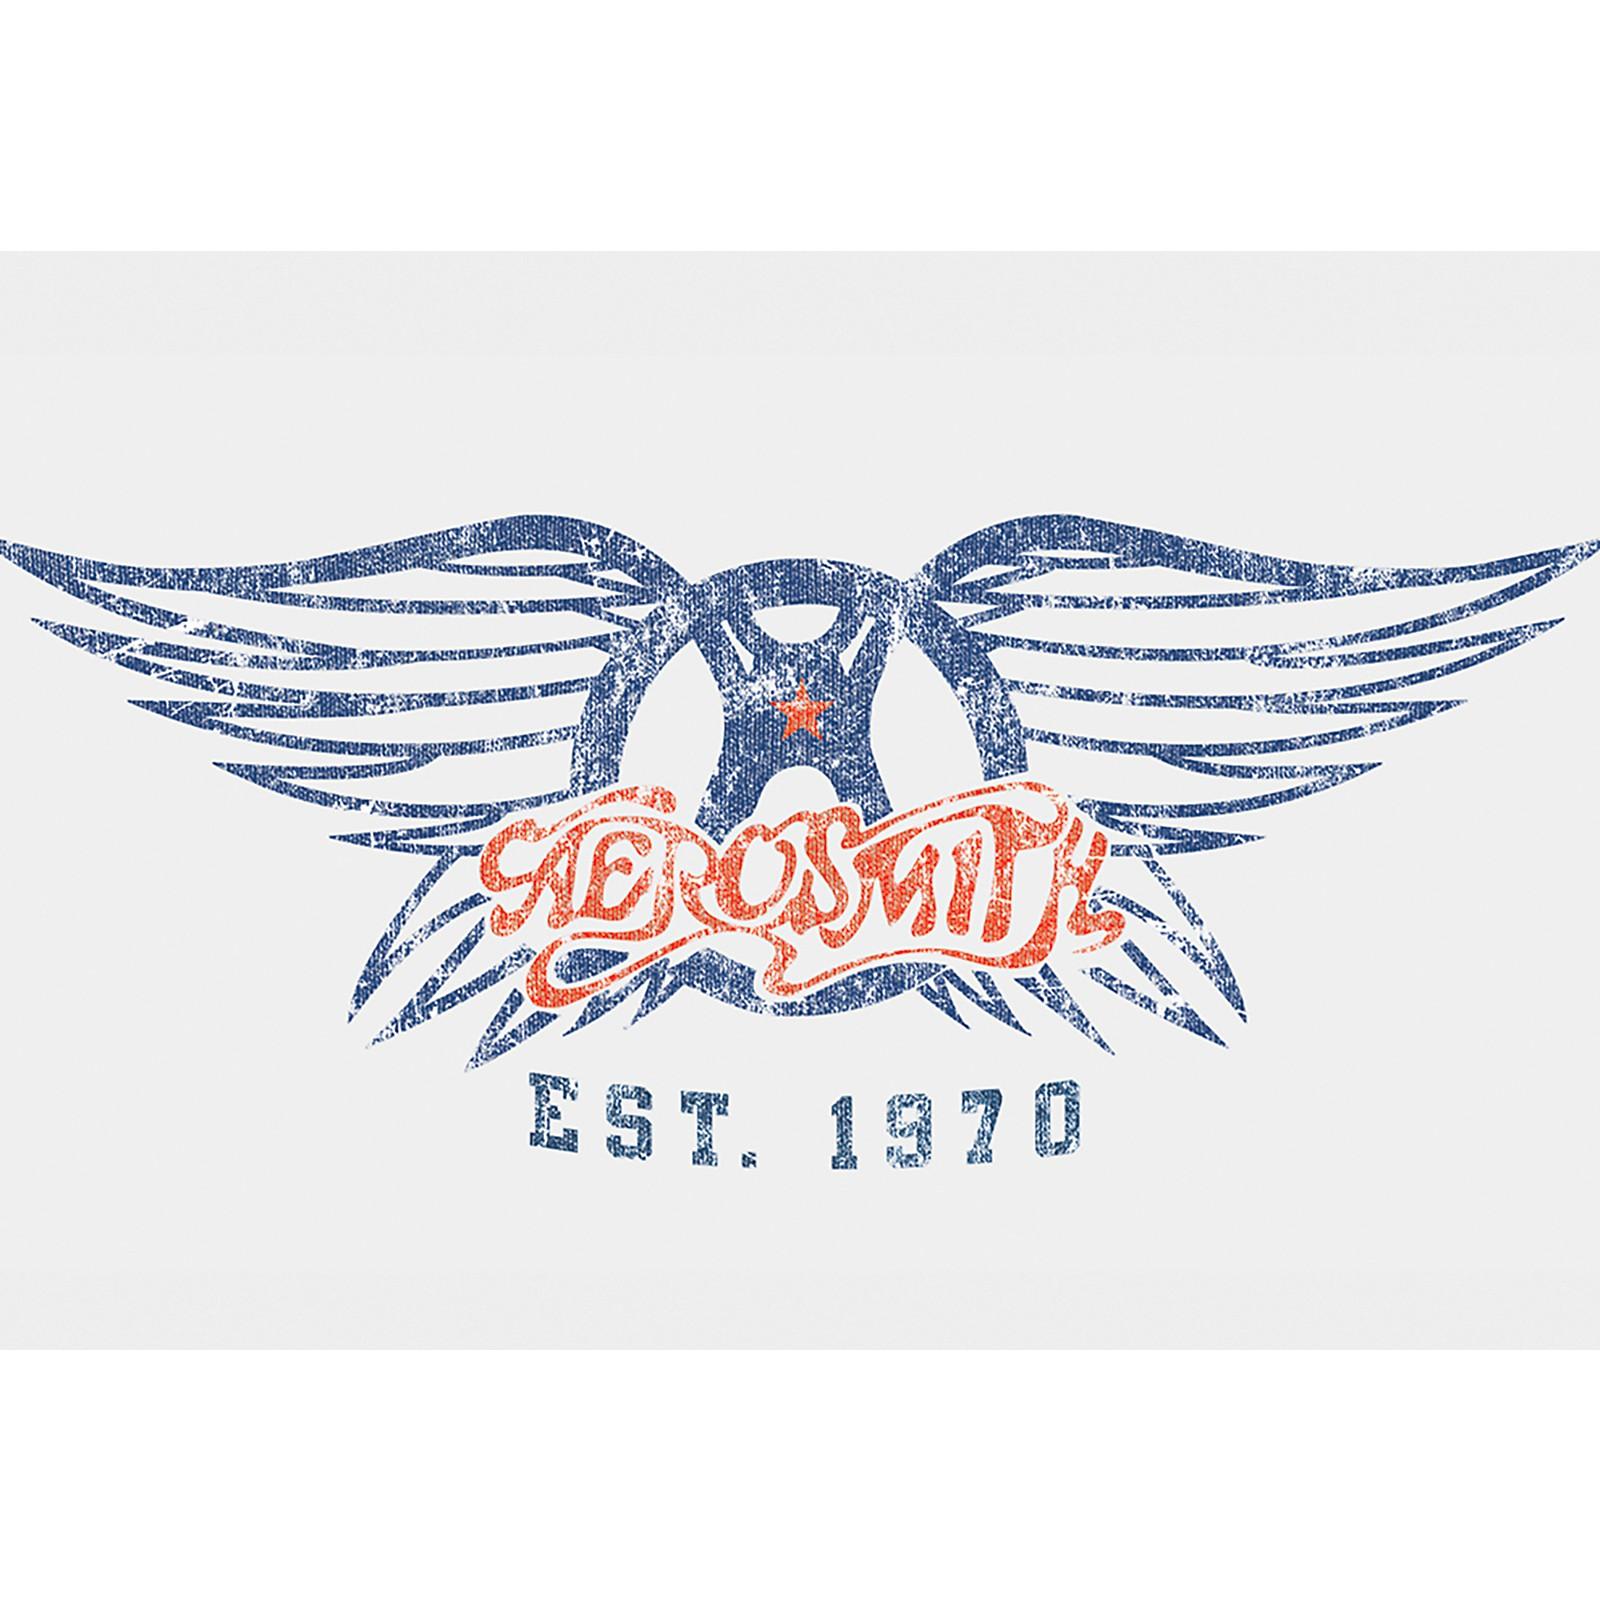 C&D Visionary Aerosmith Est. 1970 Magnet